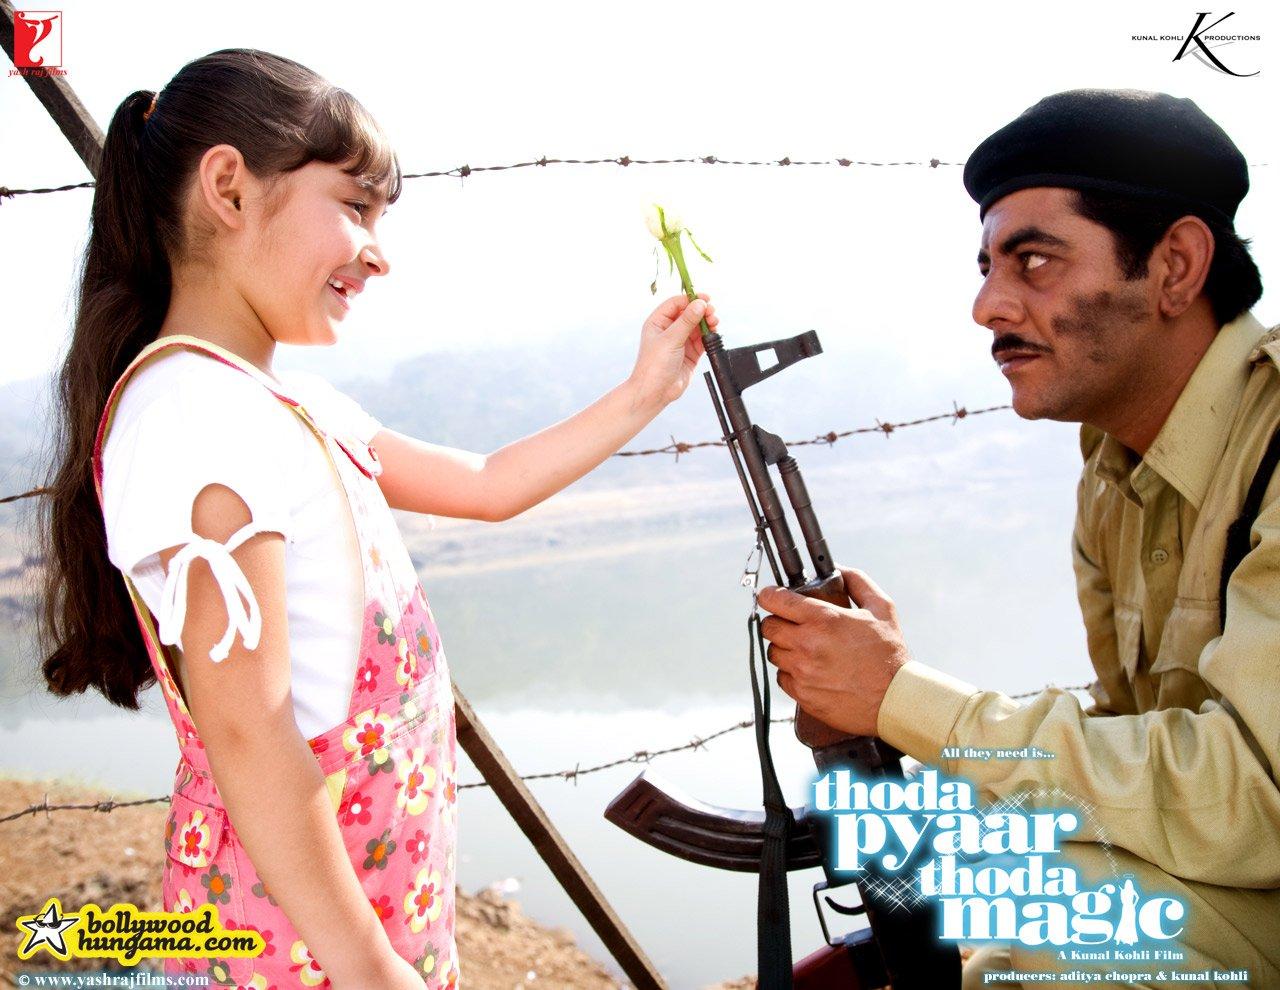 http://i.indiafm.com/posters/movies/08/thodapyaarthodamagic/still24.jpg